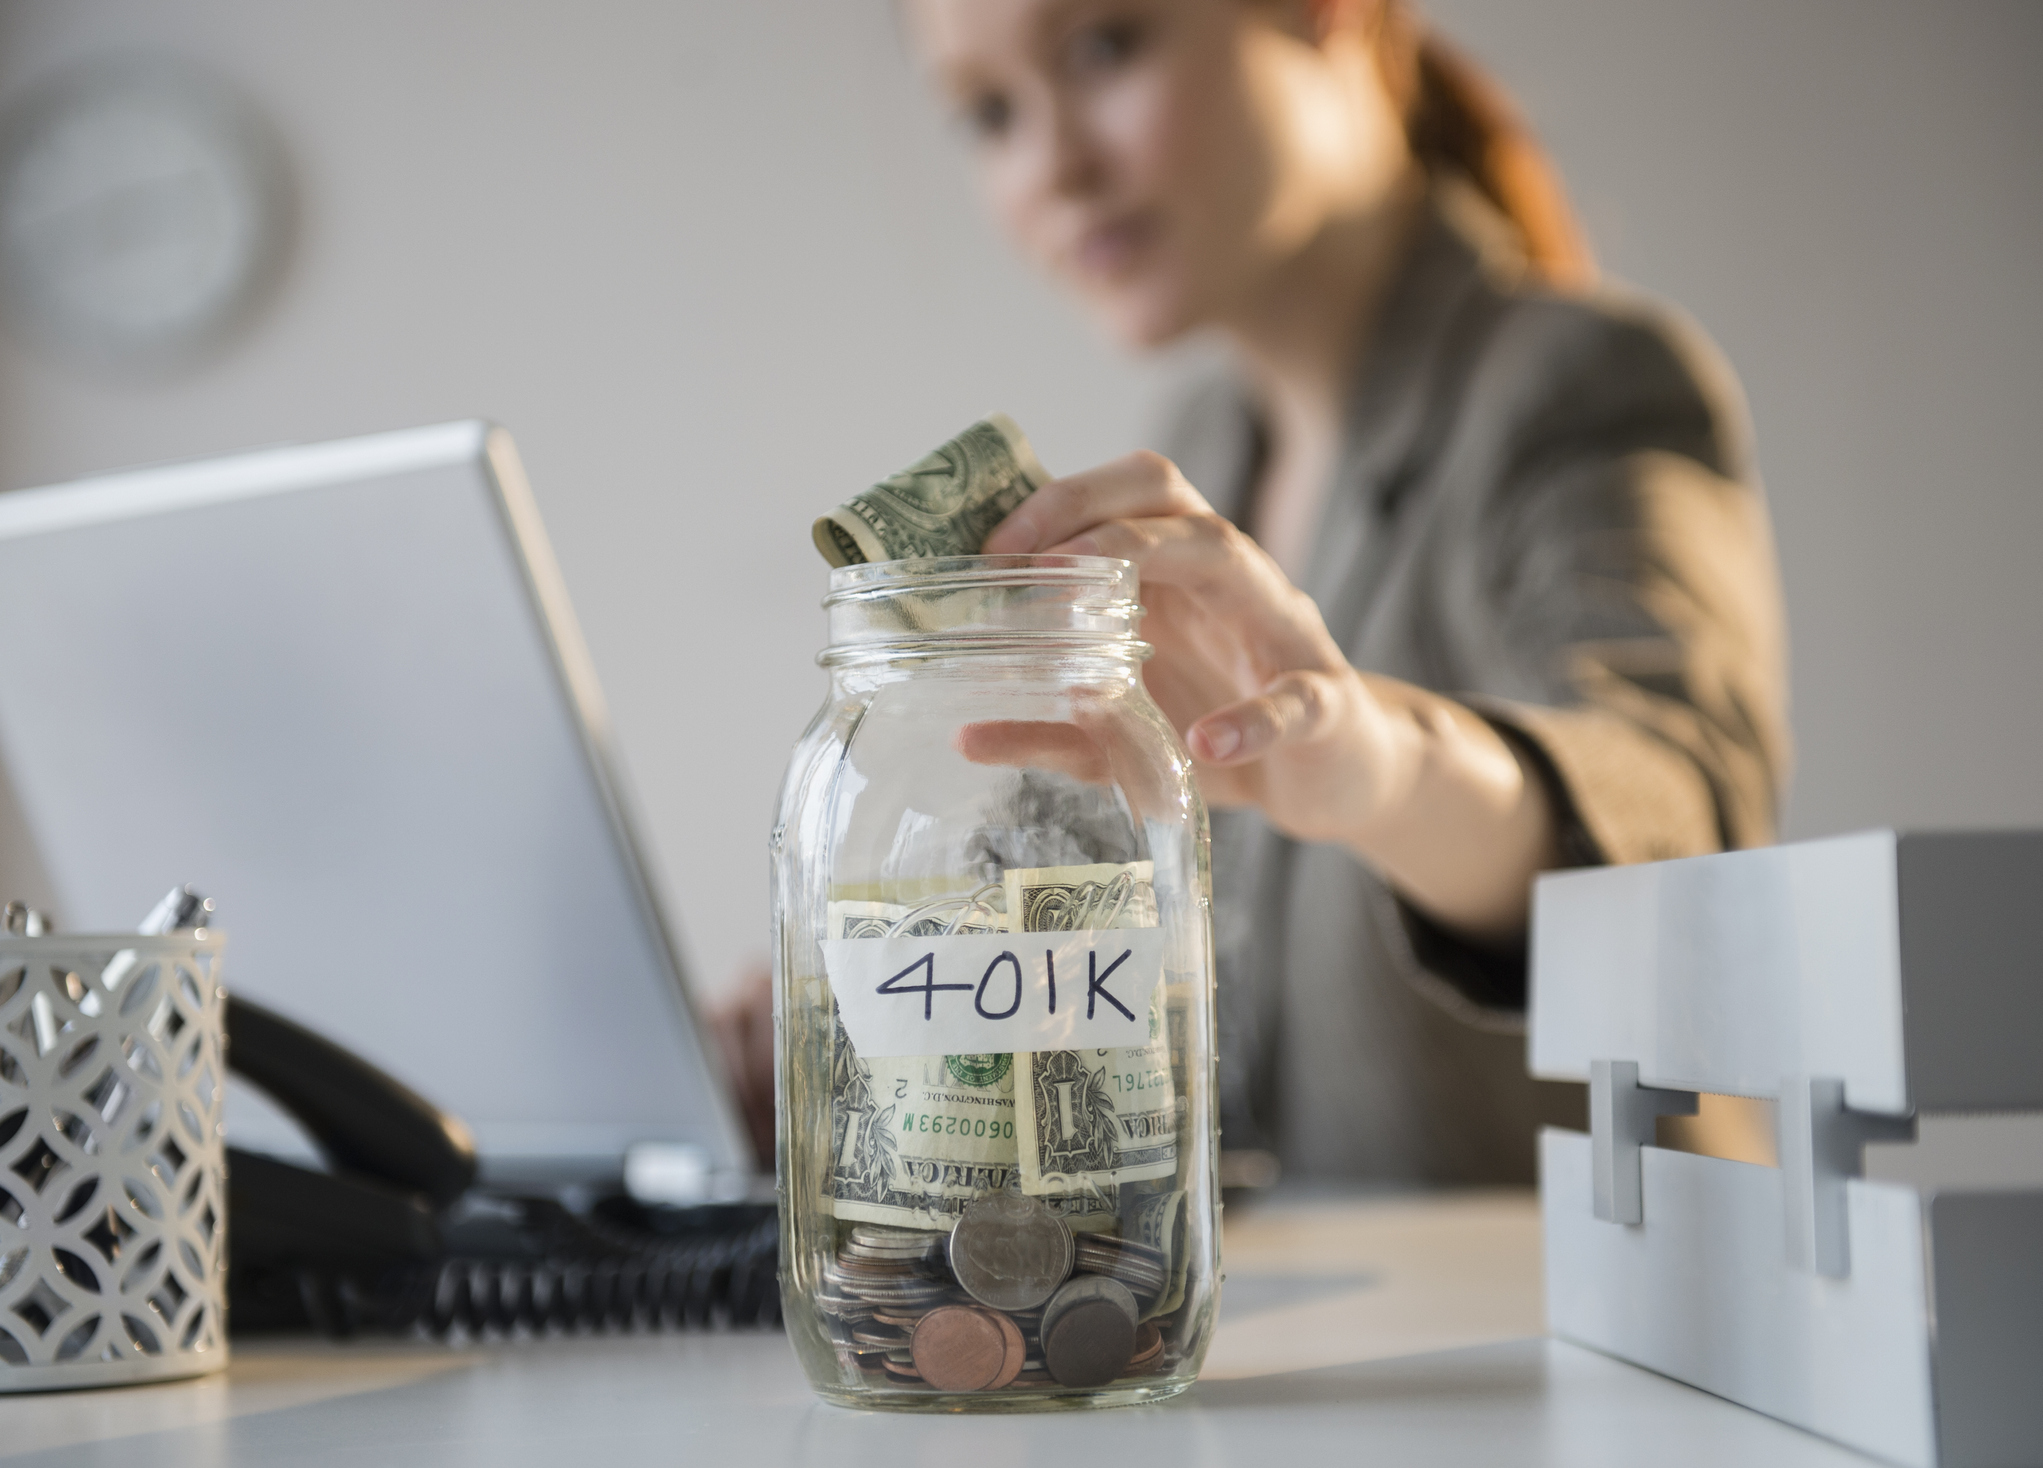 Businesswoman putting money into 401K jar at desk